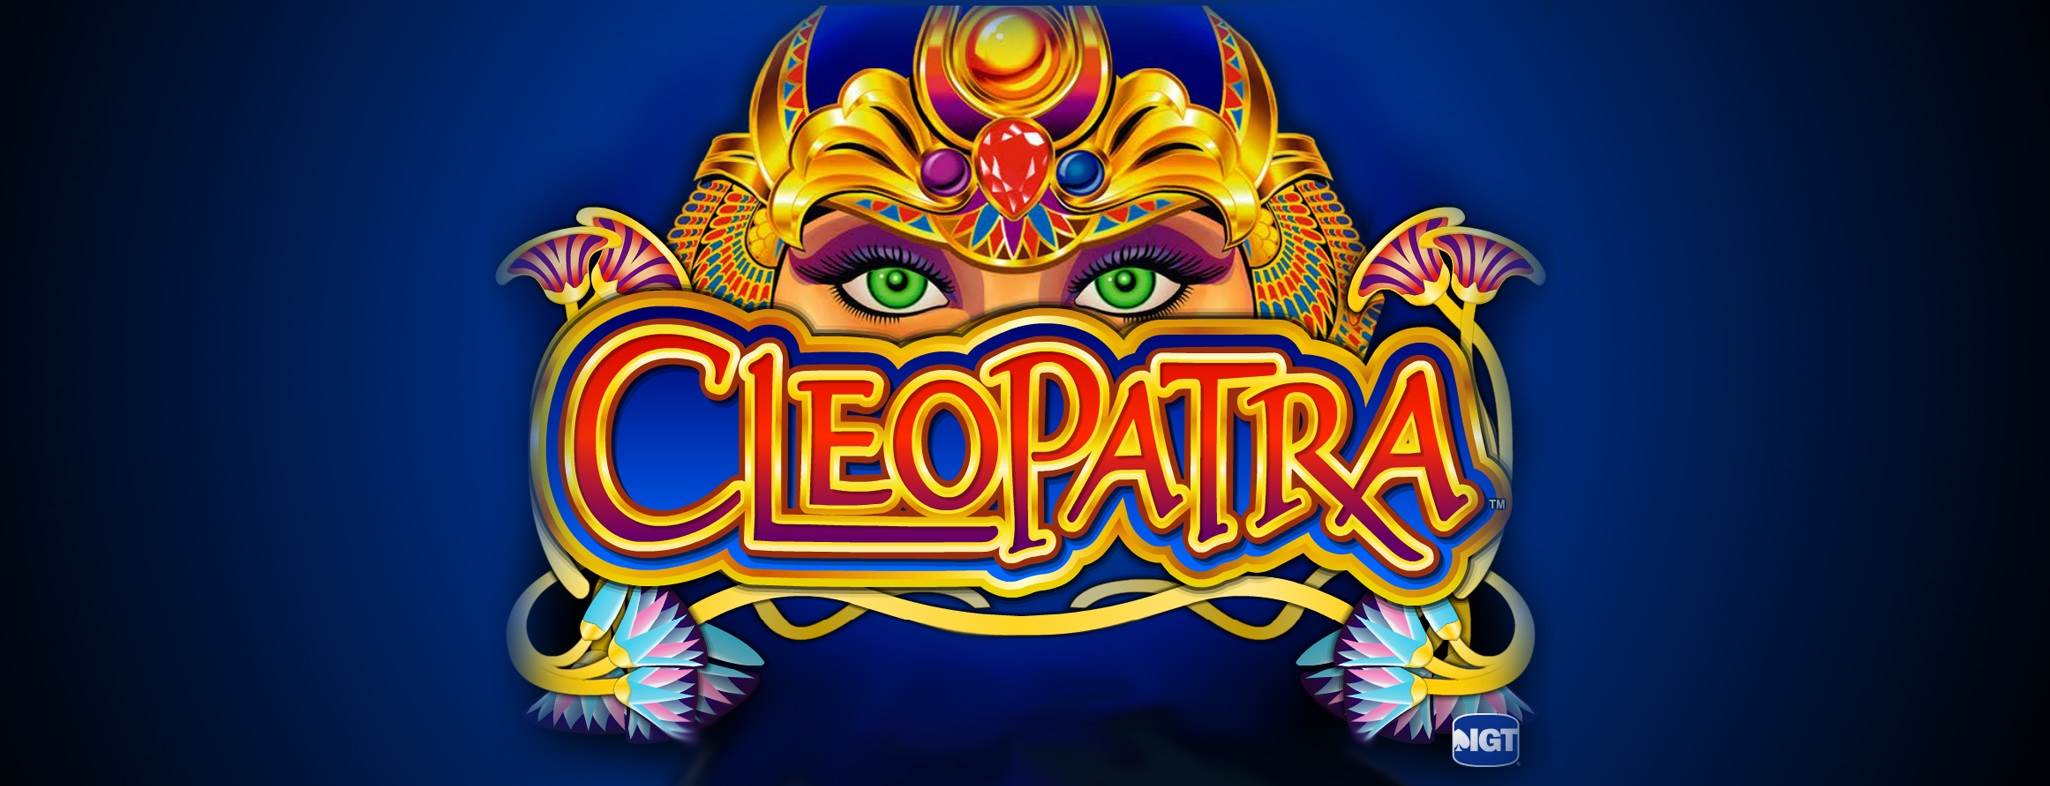 cleopatra online slot gaming logo erstellen